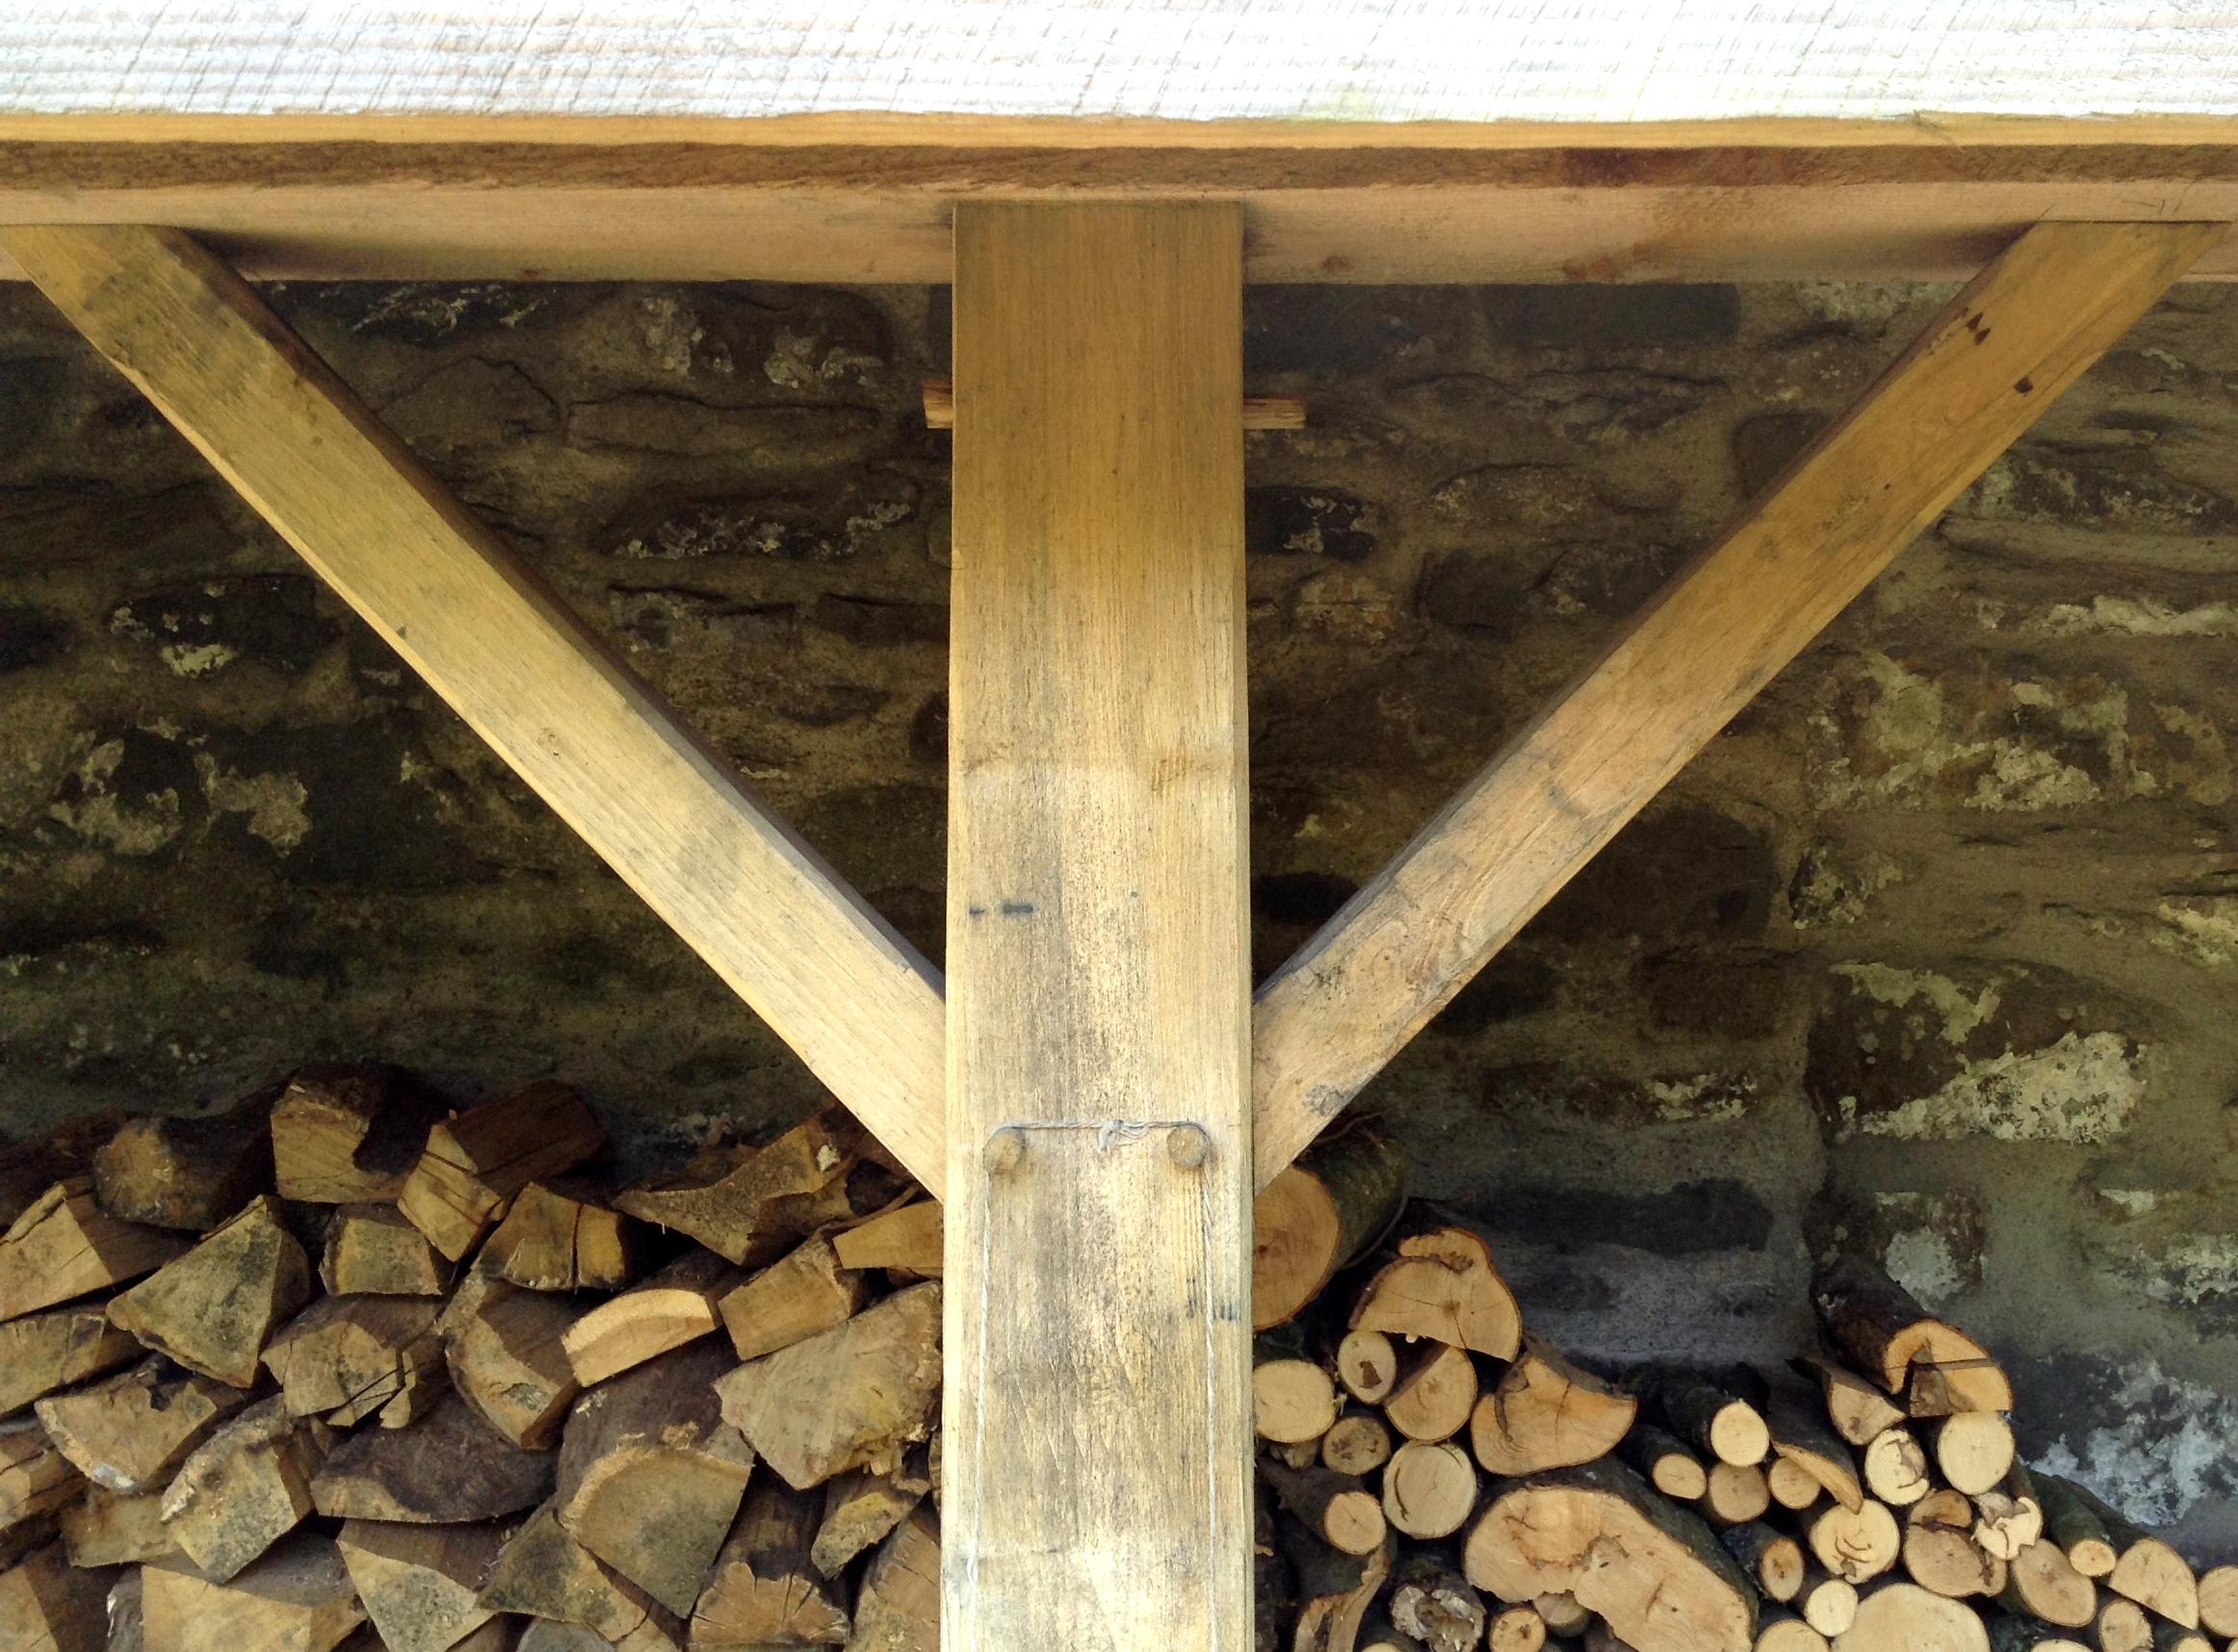 Firewood barn detail.